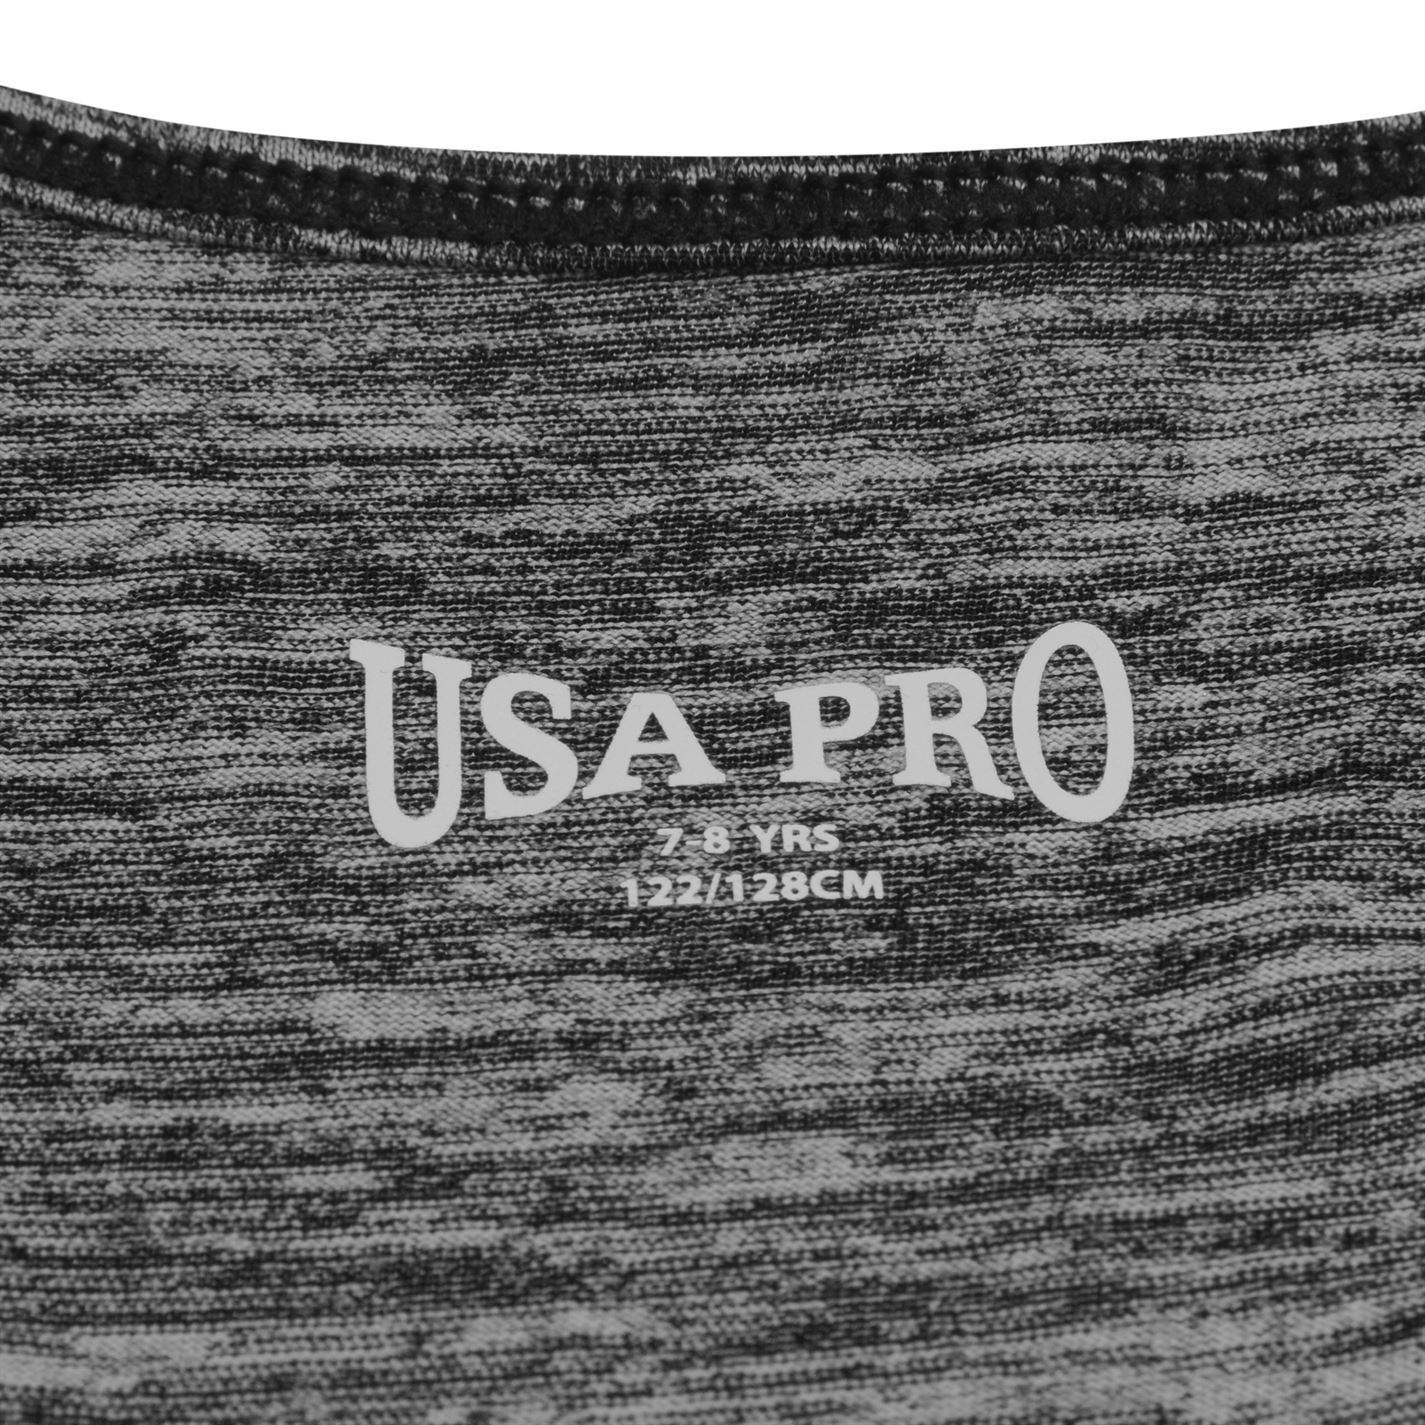 USA Pro Childrens Boyfriend Tank Top Girls Exercising Sport Casual Clothing